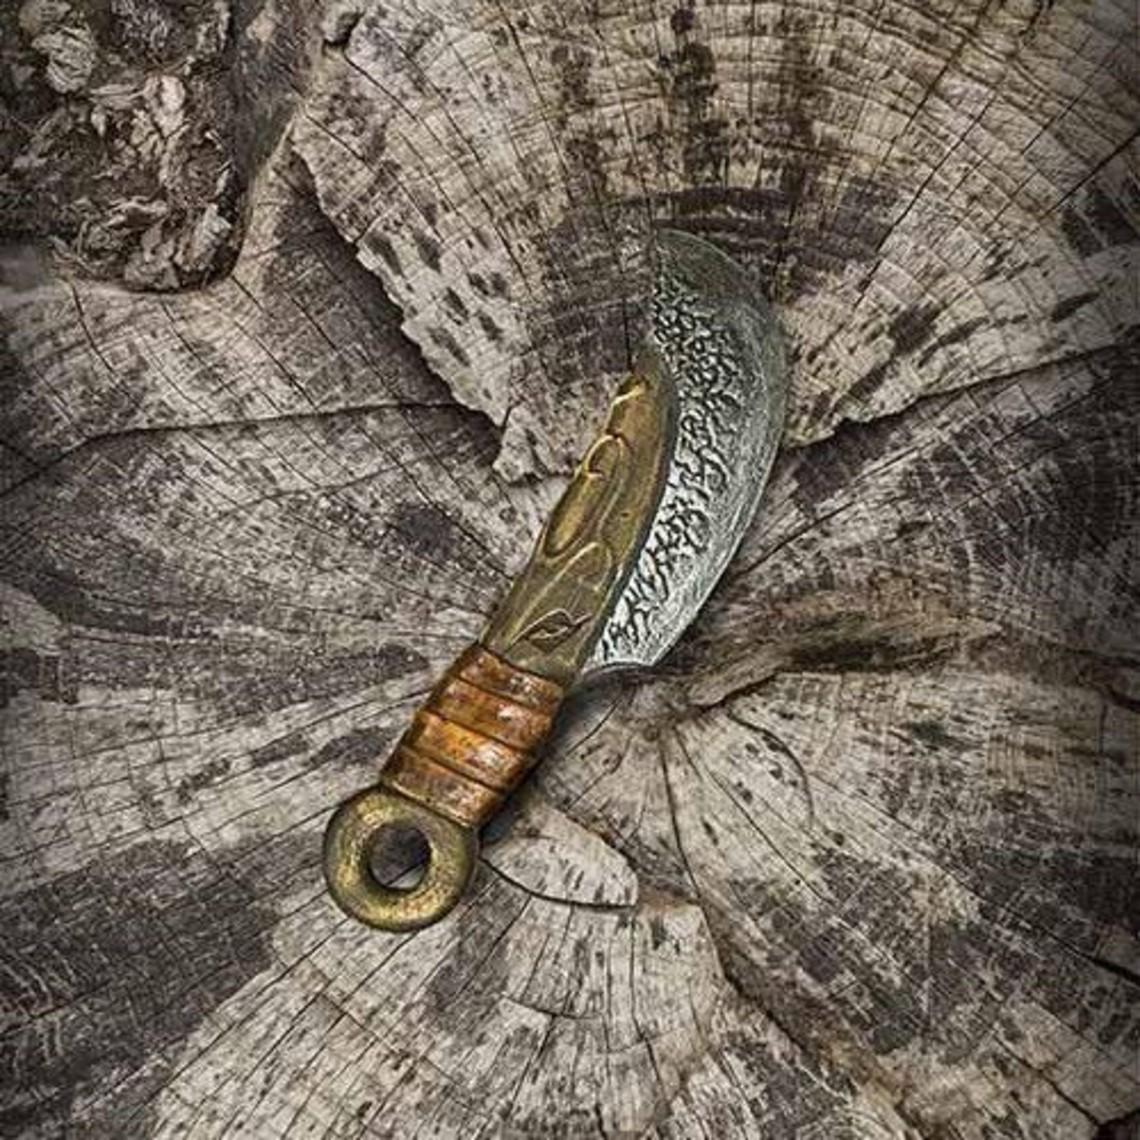 Epic Armoury GRV coltello skinner